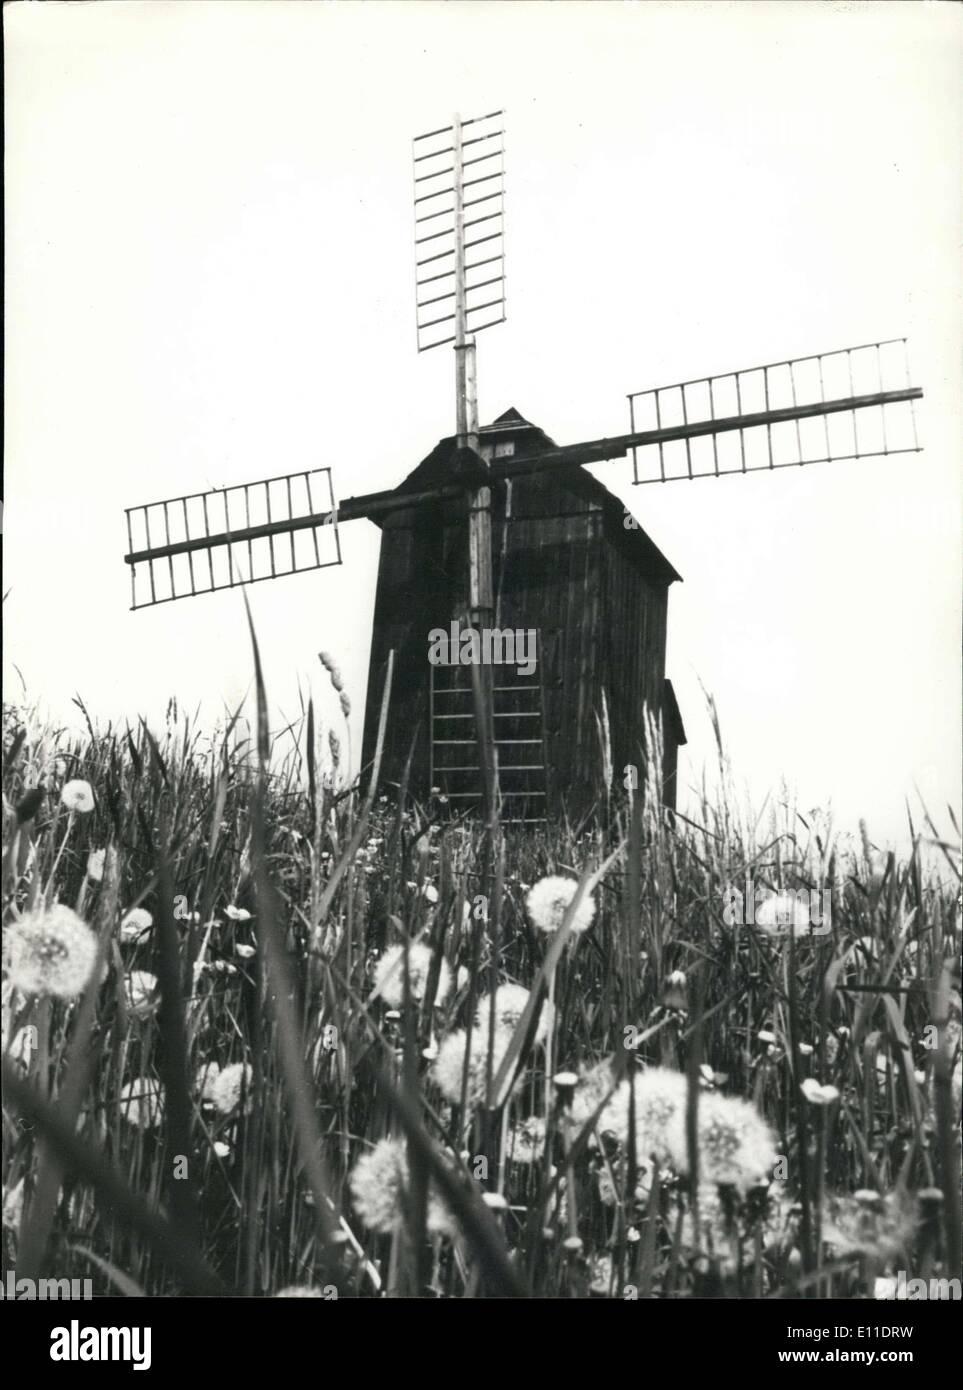 Aug. 23, 1977 - Windmill in Ostrava-Poruba, Czechoslovakia - Stock Image